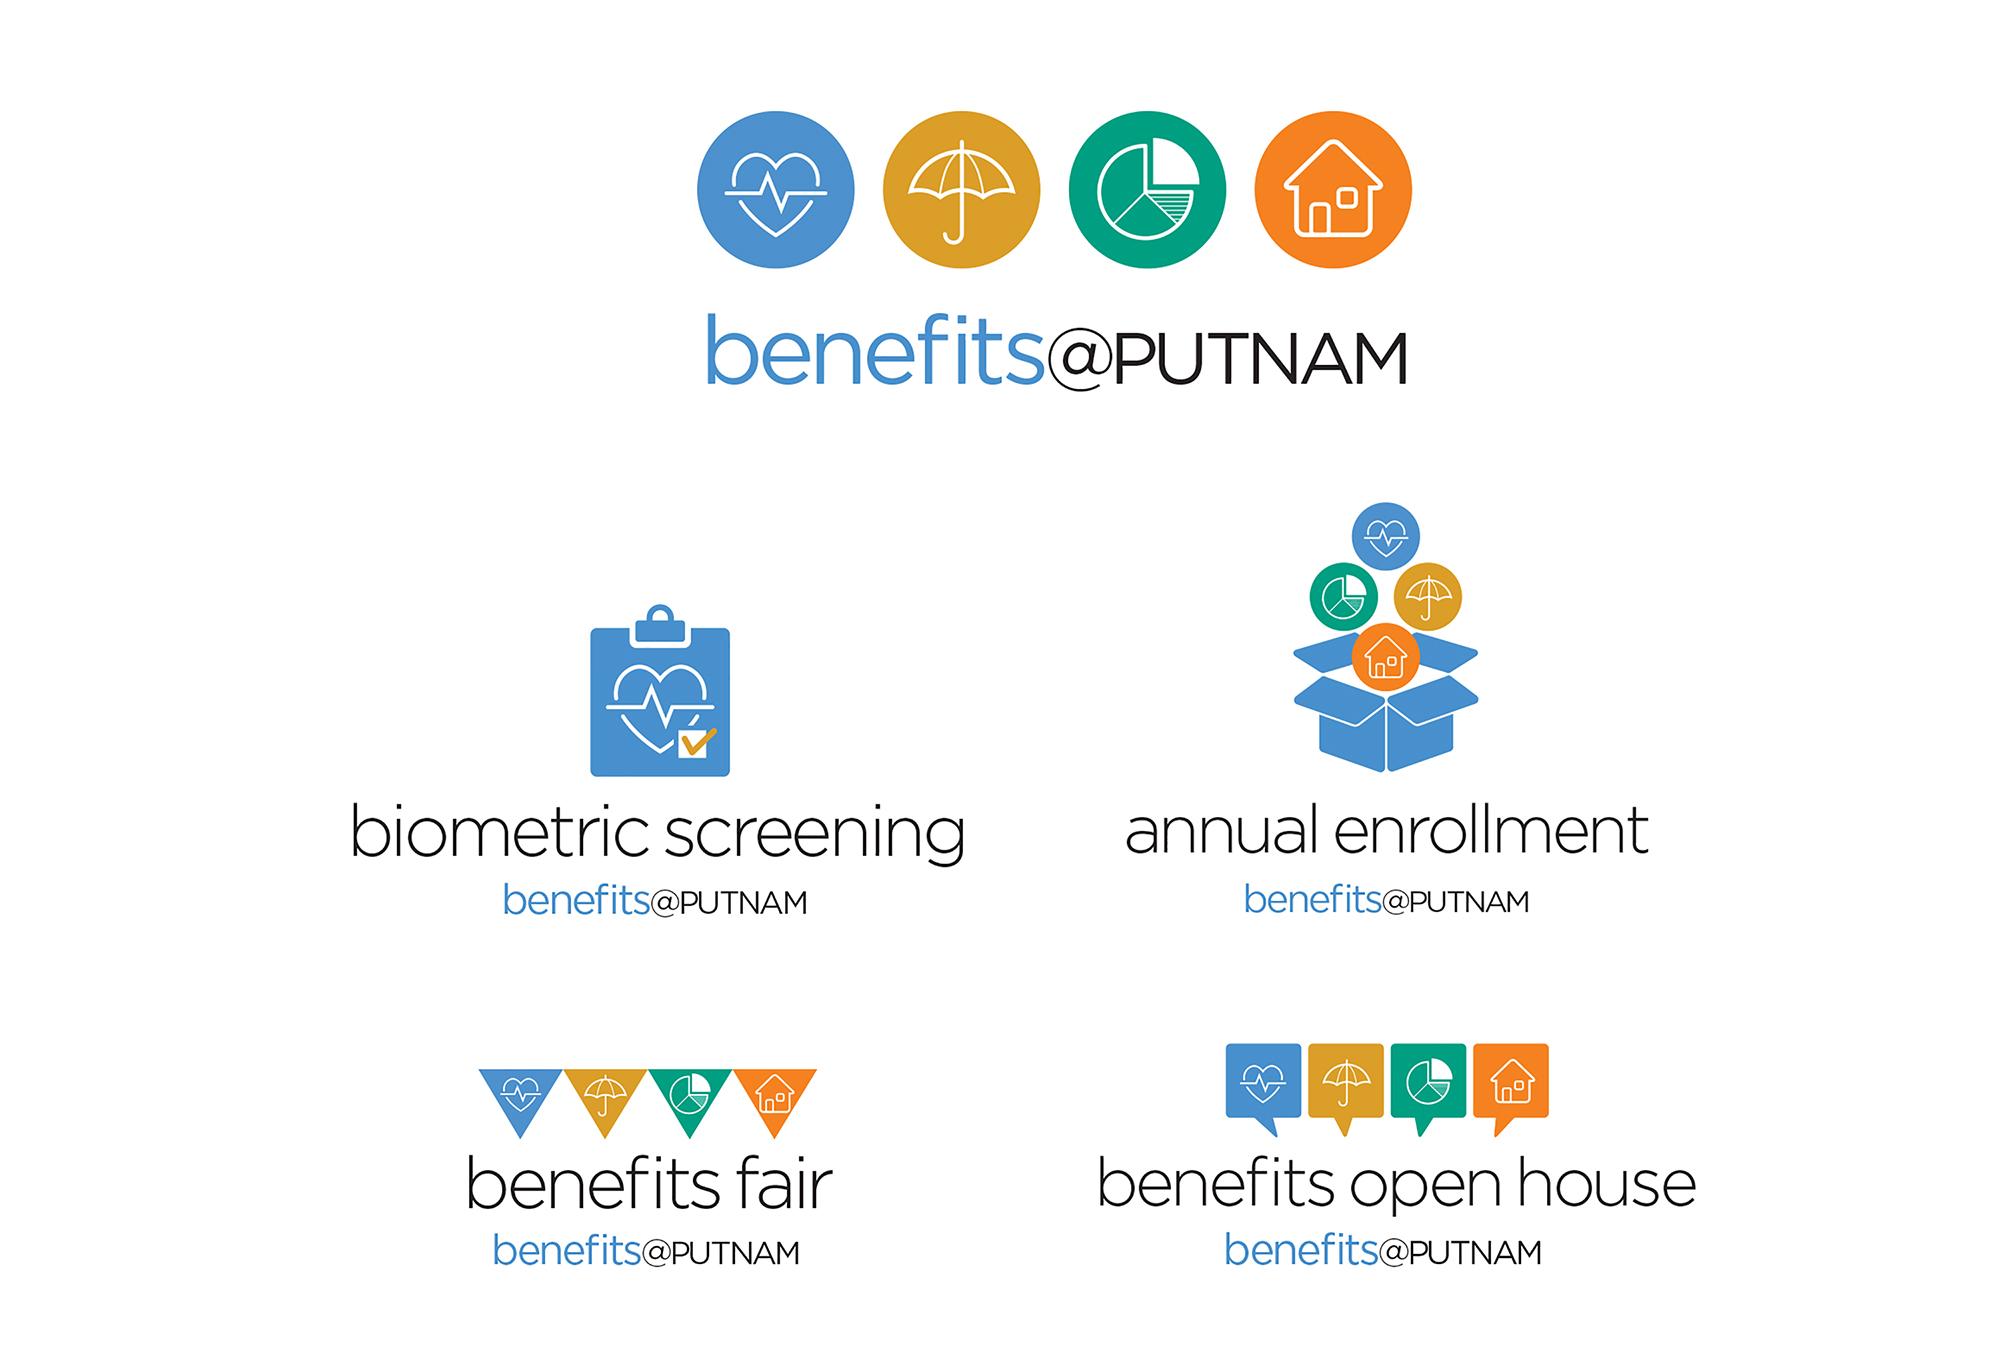 Putnam-Benefits-2015-logos